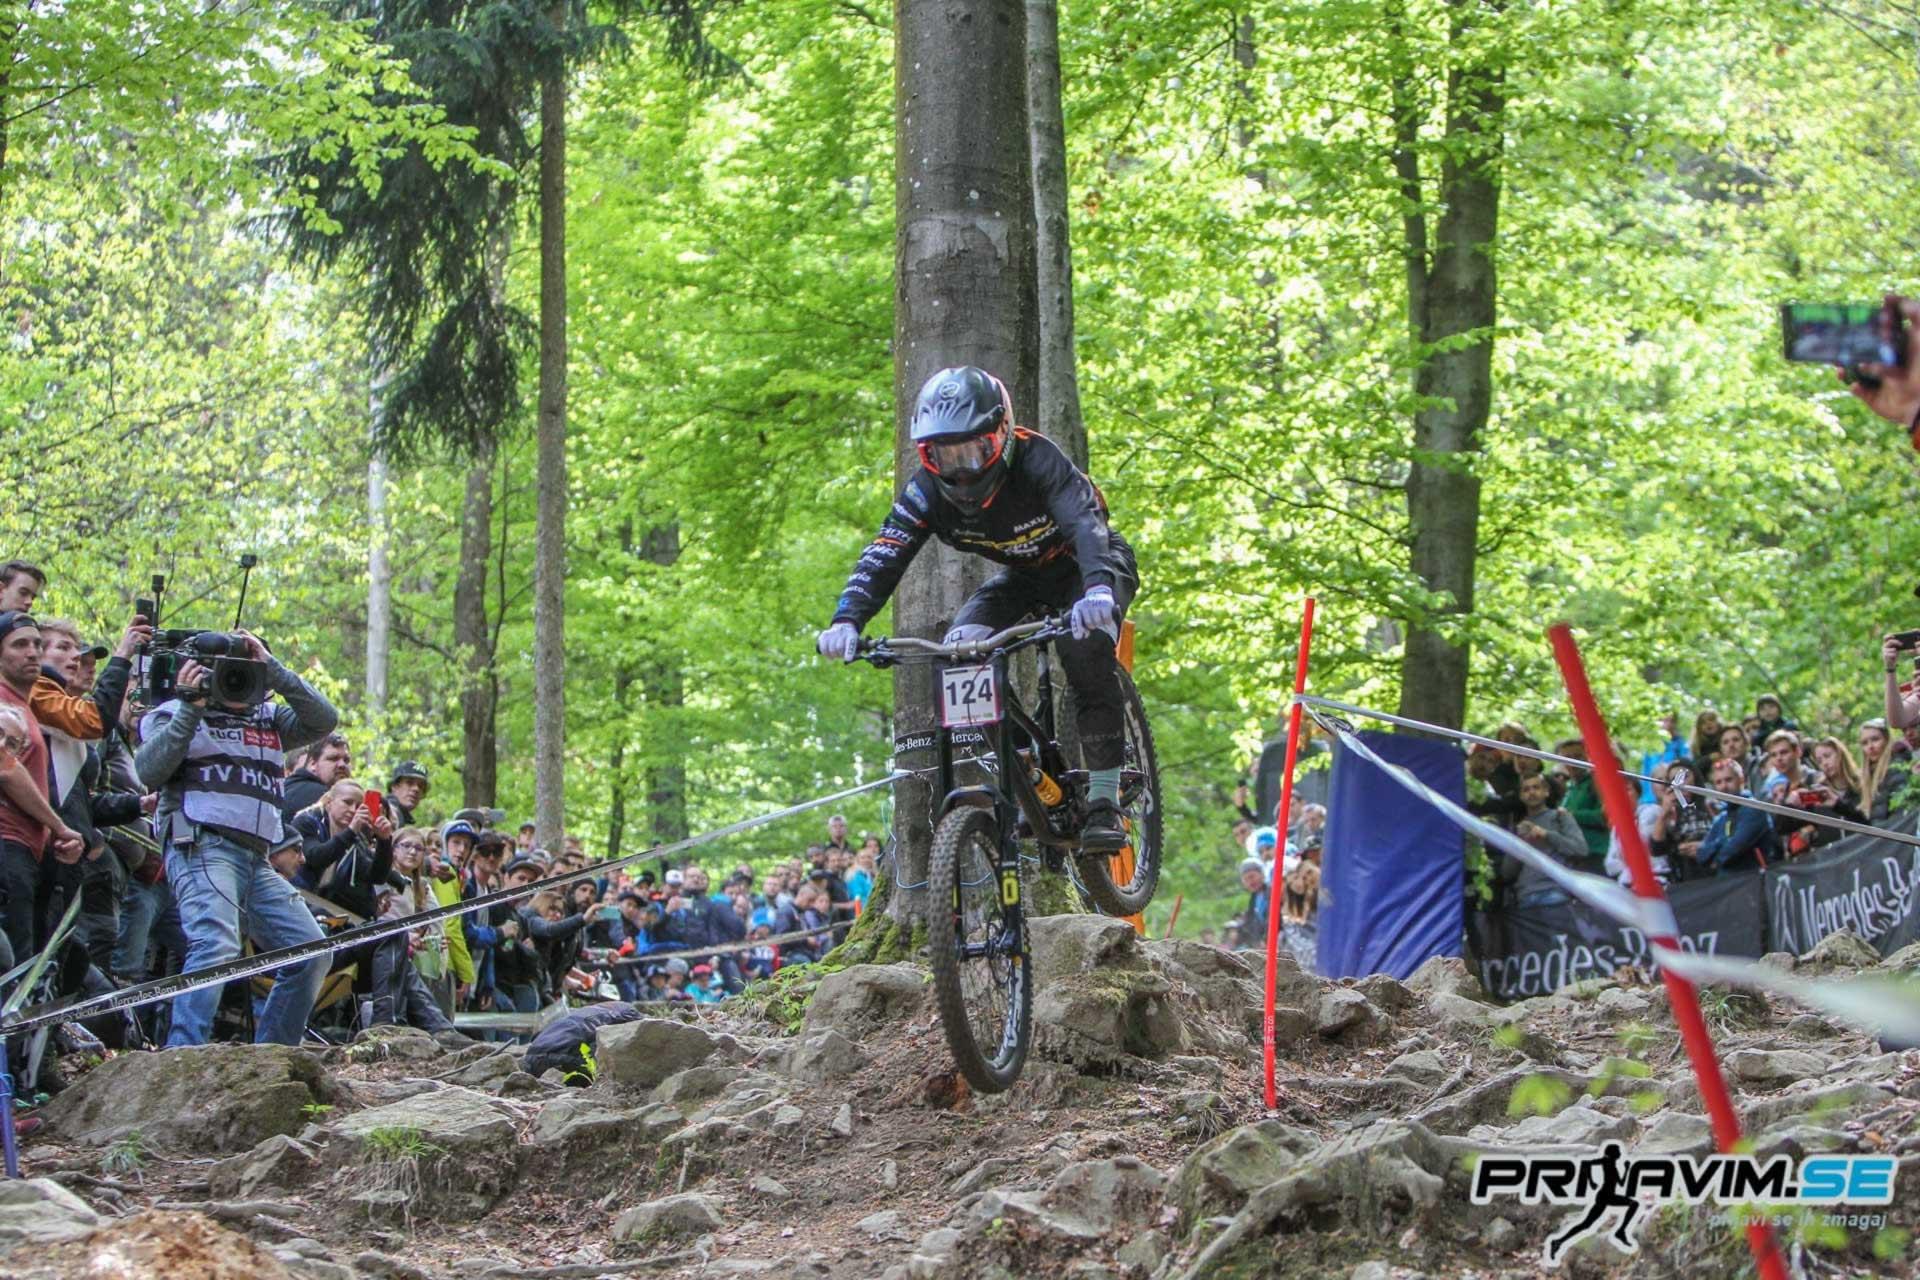 DH_WC_Maribor2019-0001.jpg